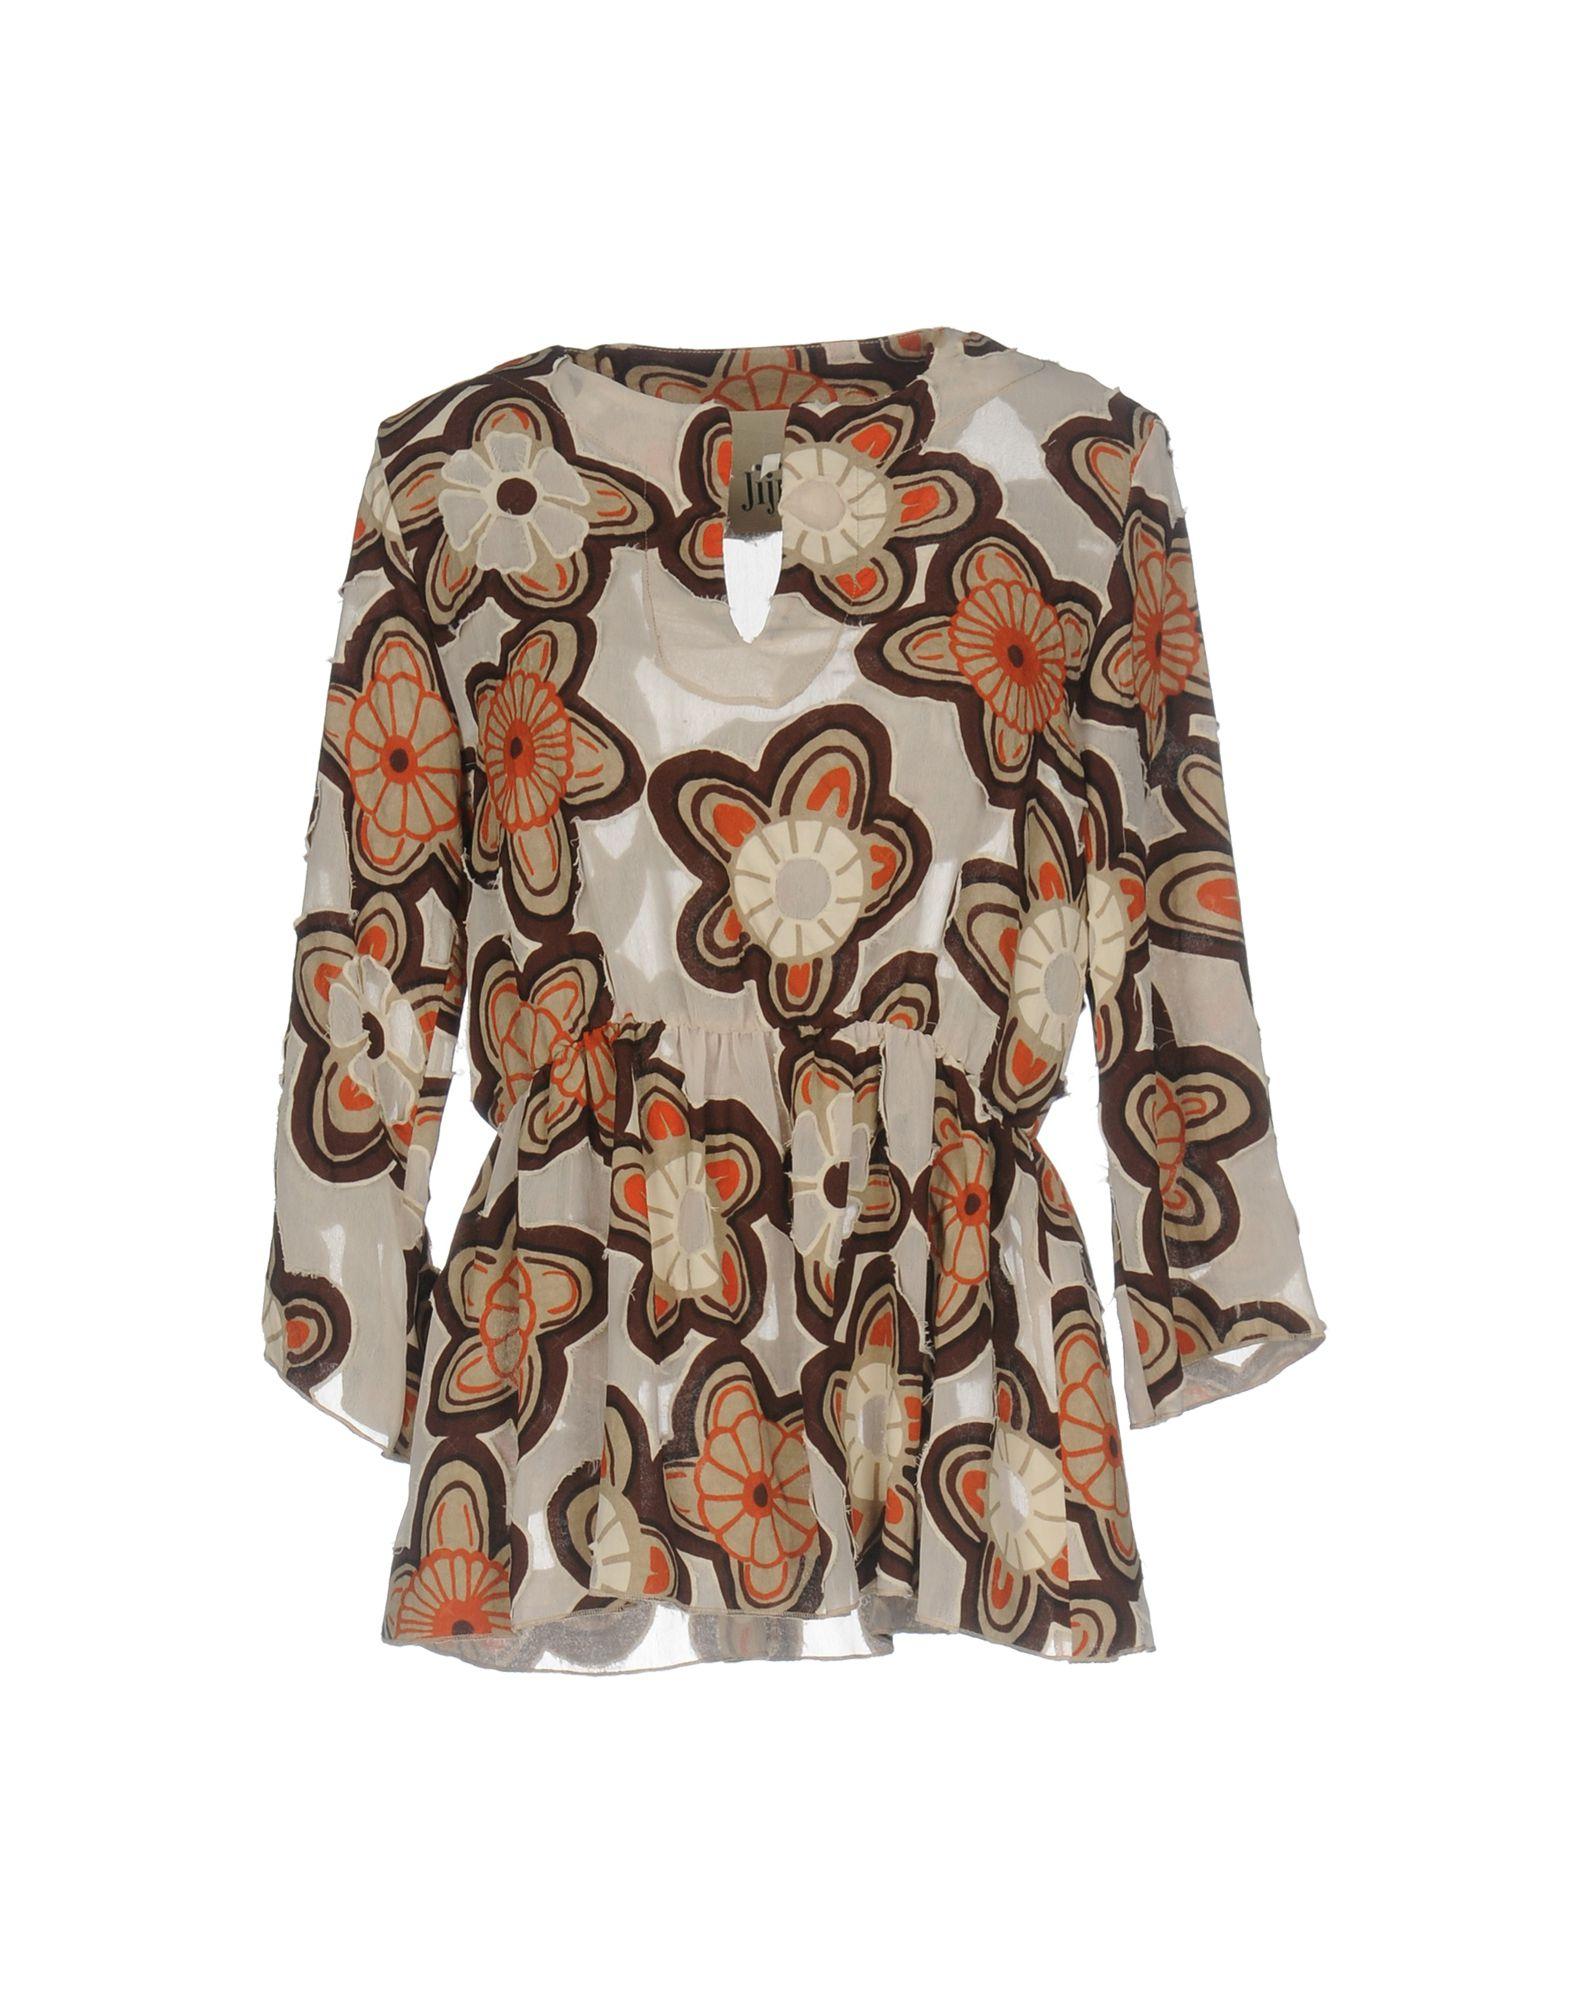 JIJIL Damen Bluse Farbe Beige Größe 7 jetztbilligerkaufen